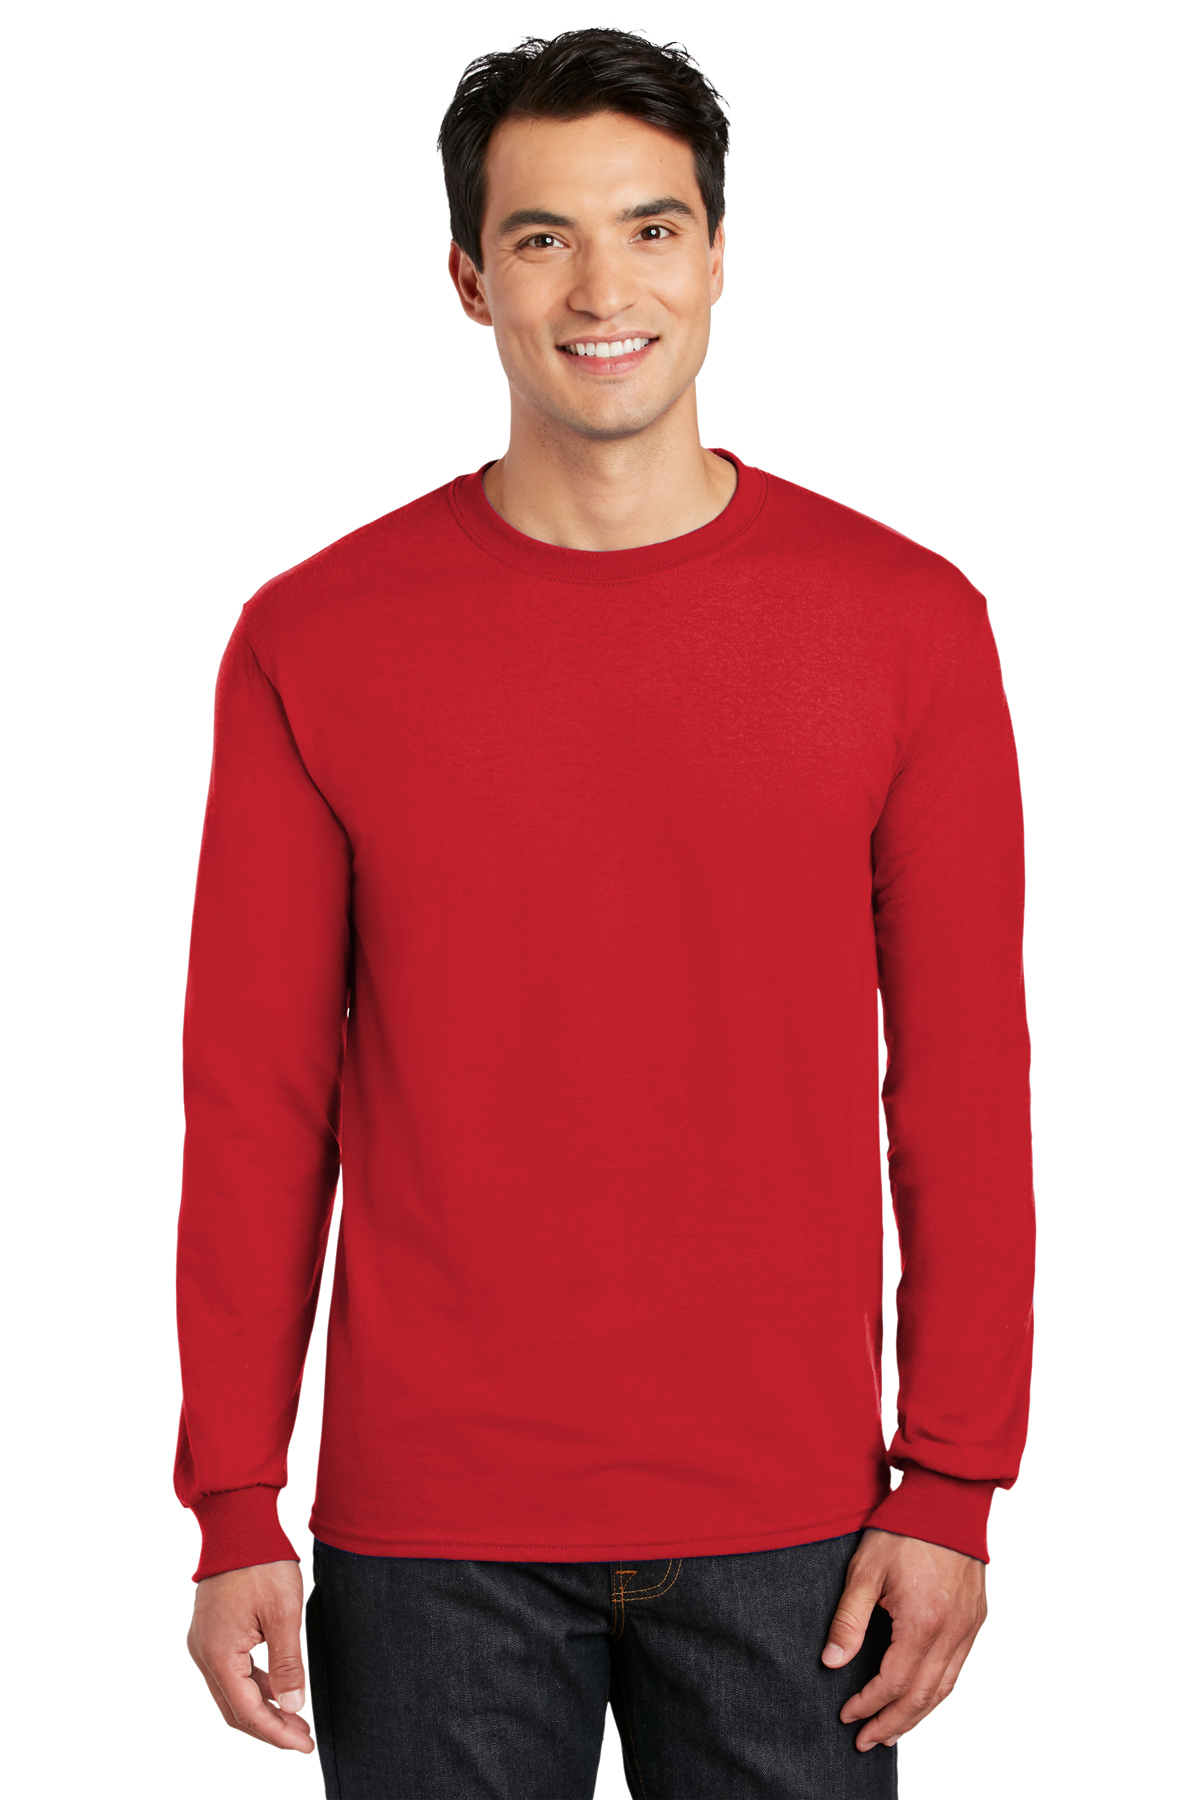 Gildan- DryBlend 50 Cotton/50 Poly Long Sleeve T-Shirt